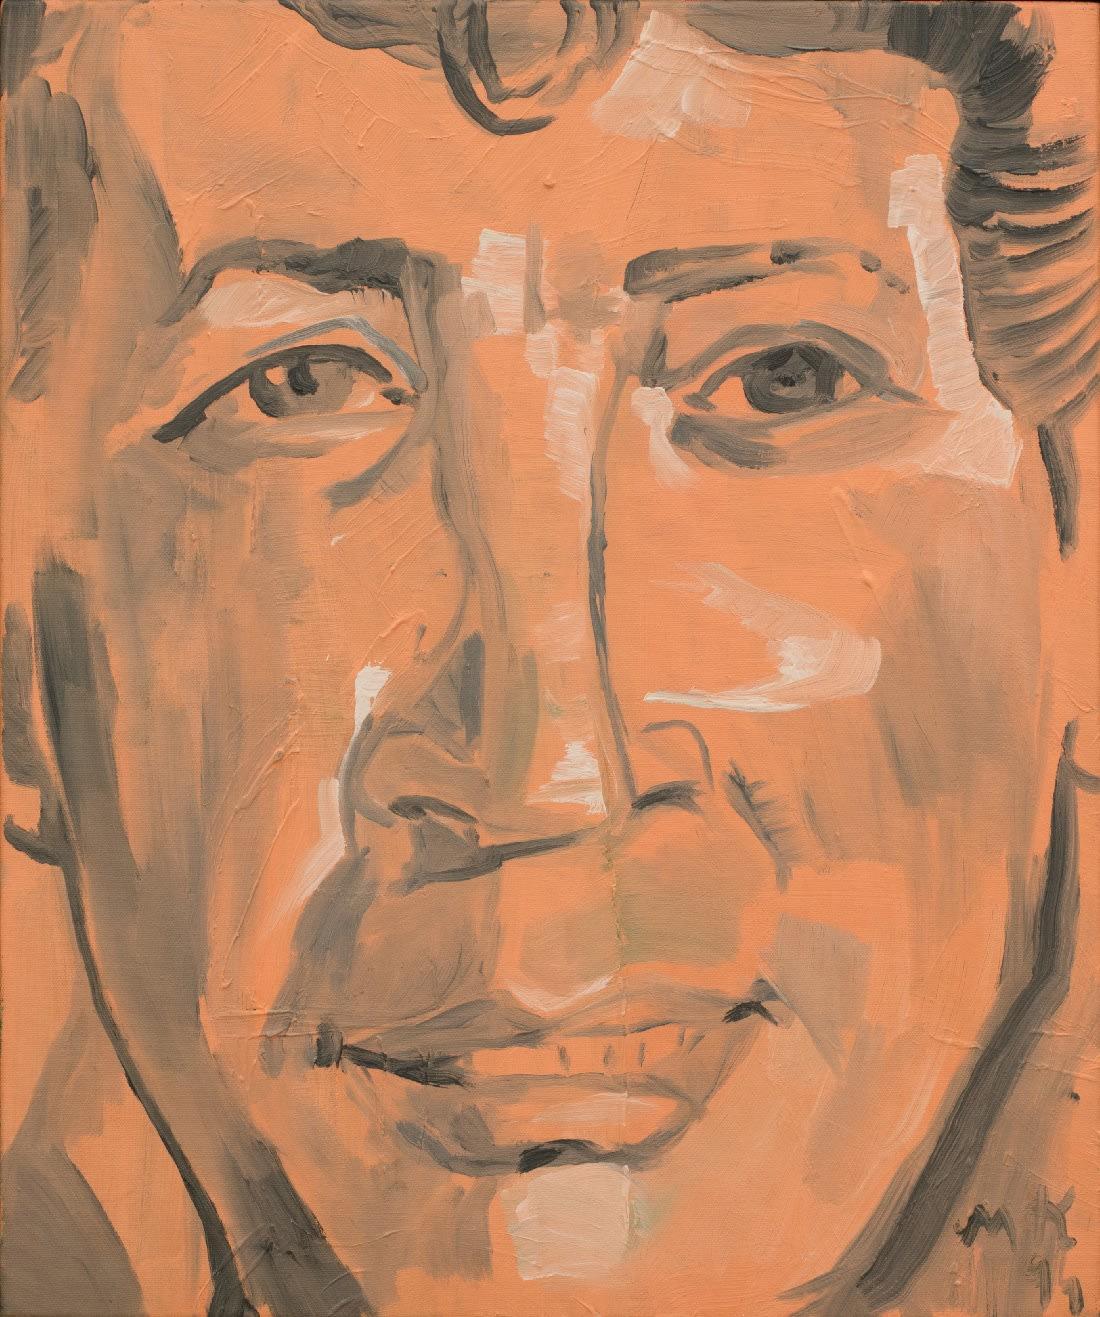 Martin Kippenberger Portrait Dean Martin 1994 oil on canvas 24 x 20 inches 61 x 50.8 cm More Info